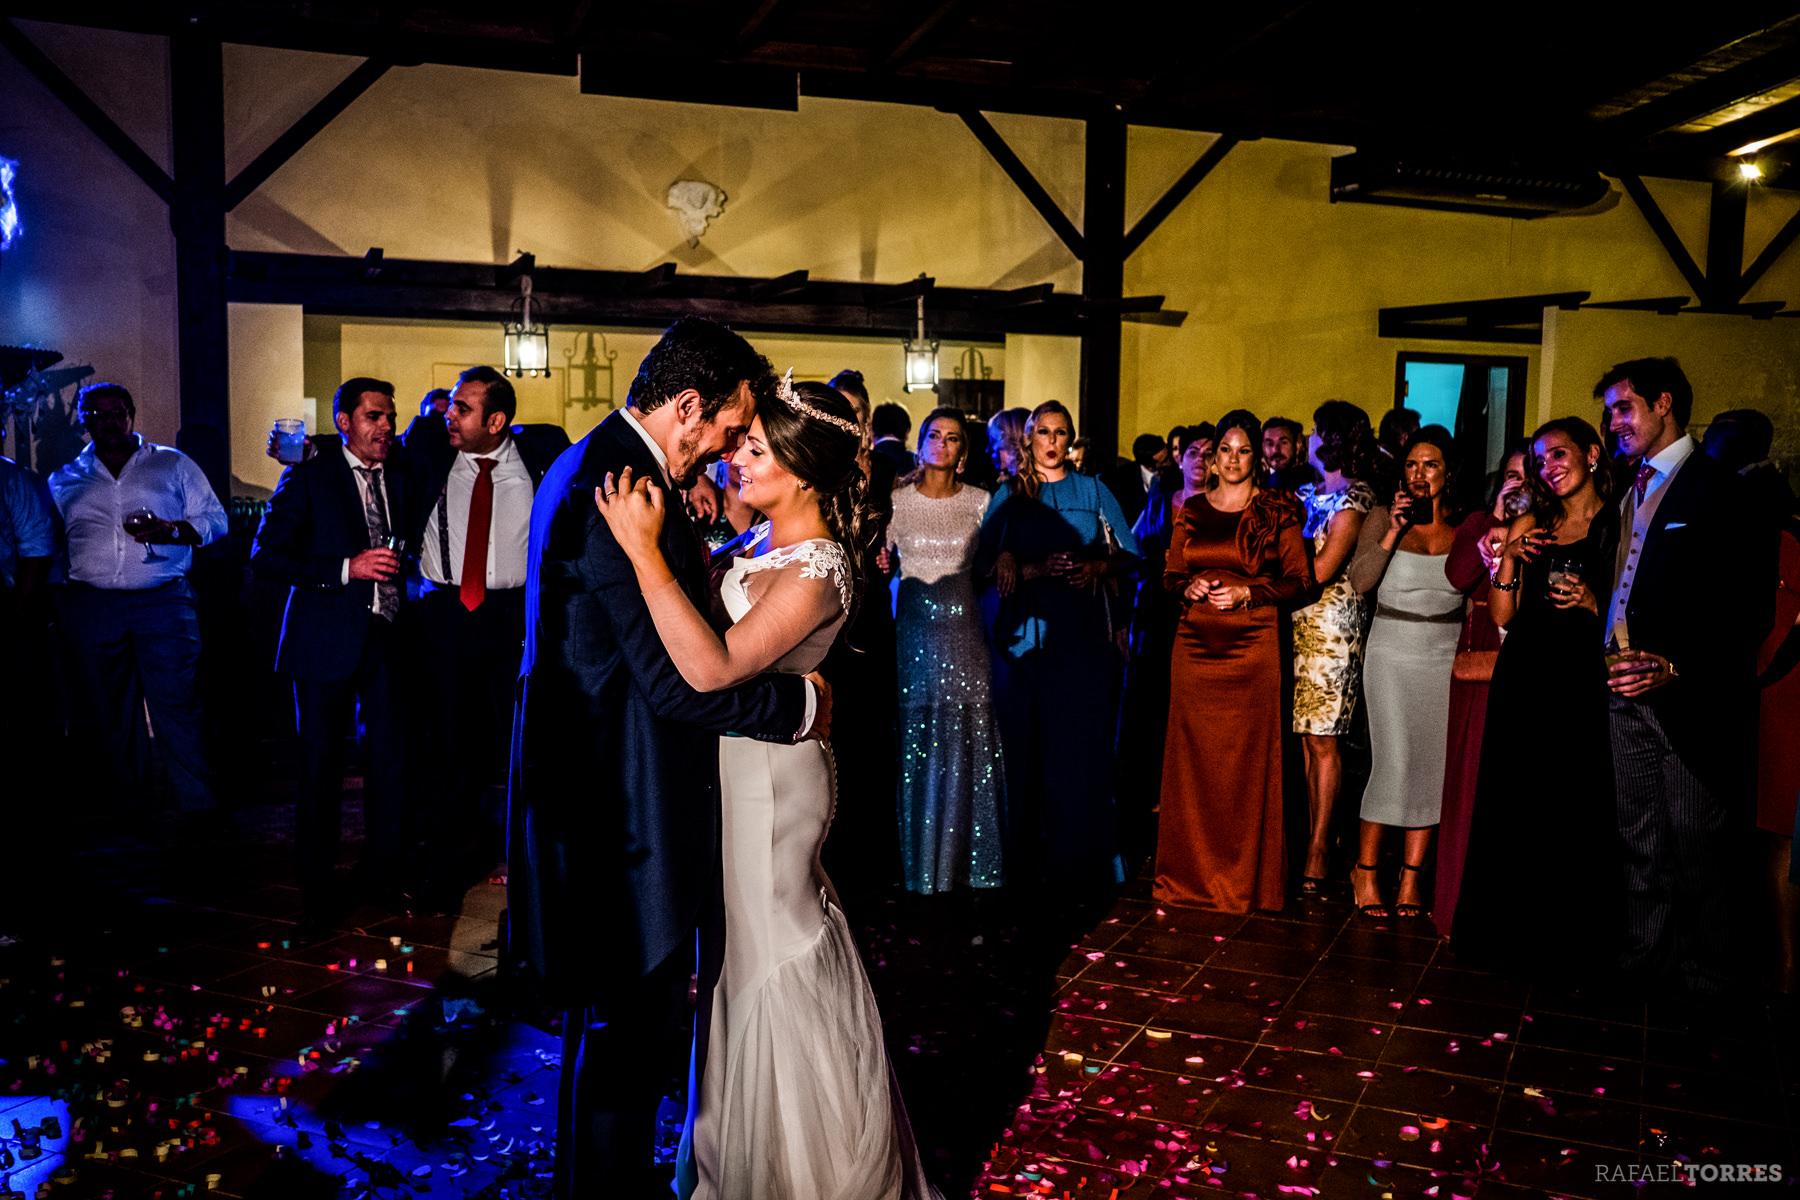 bea-juan-carmona-fotografo-boda-en-sevilla-rafael-torres-photo-48.jpg